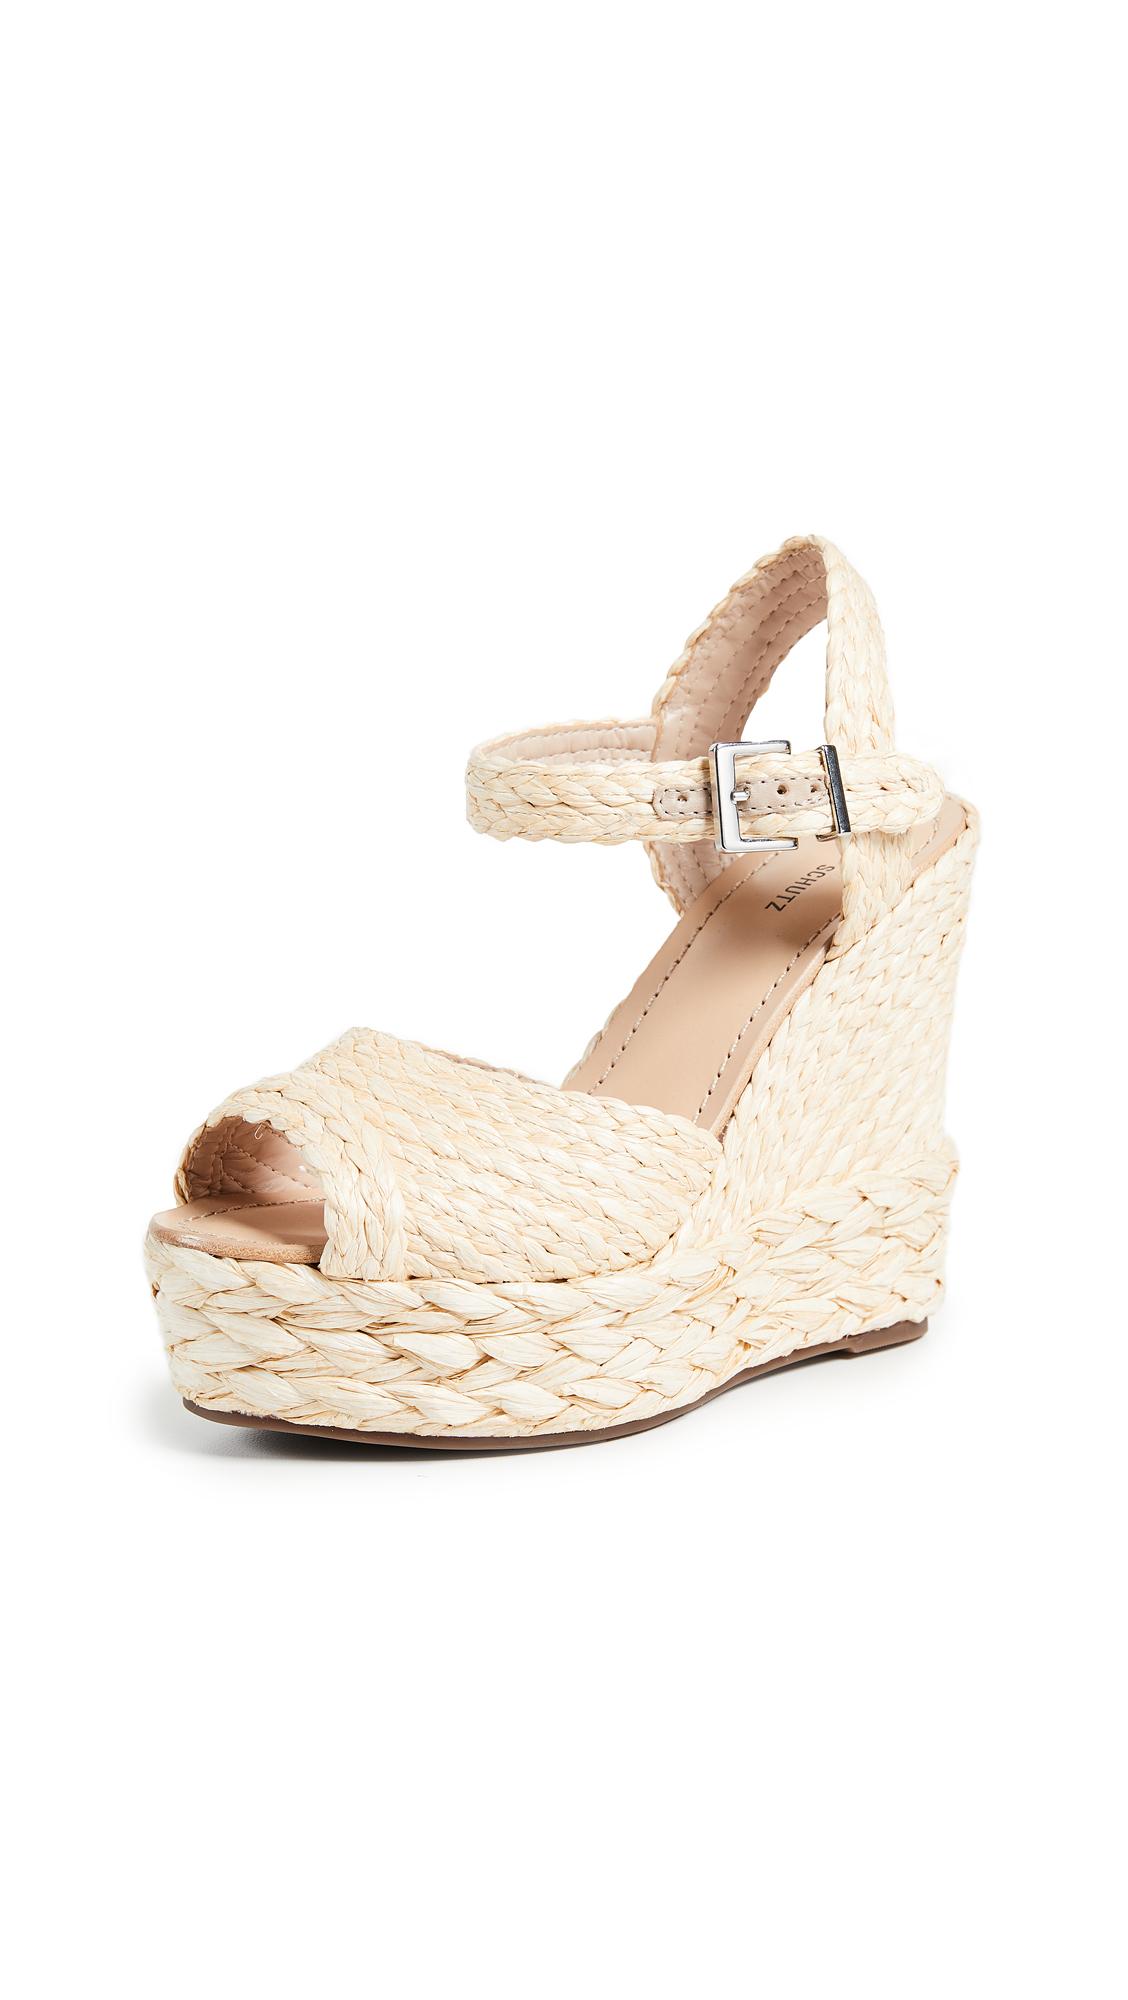 Schutz Belatrix Espadrille Sandals - Natural/Black